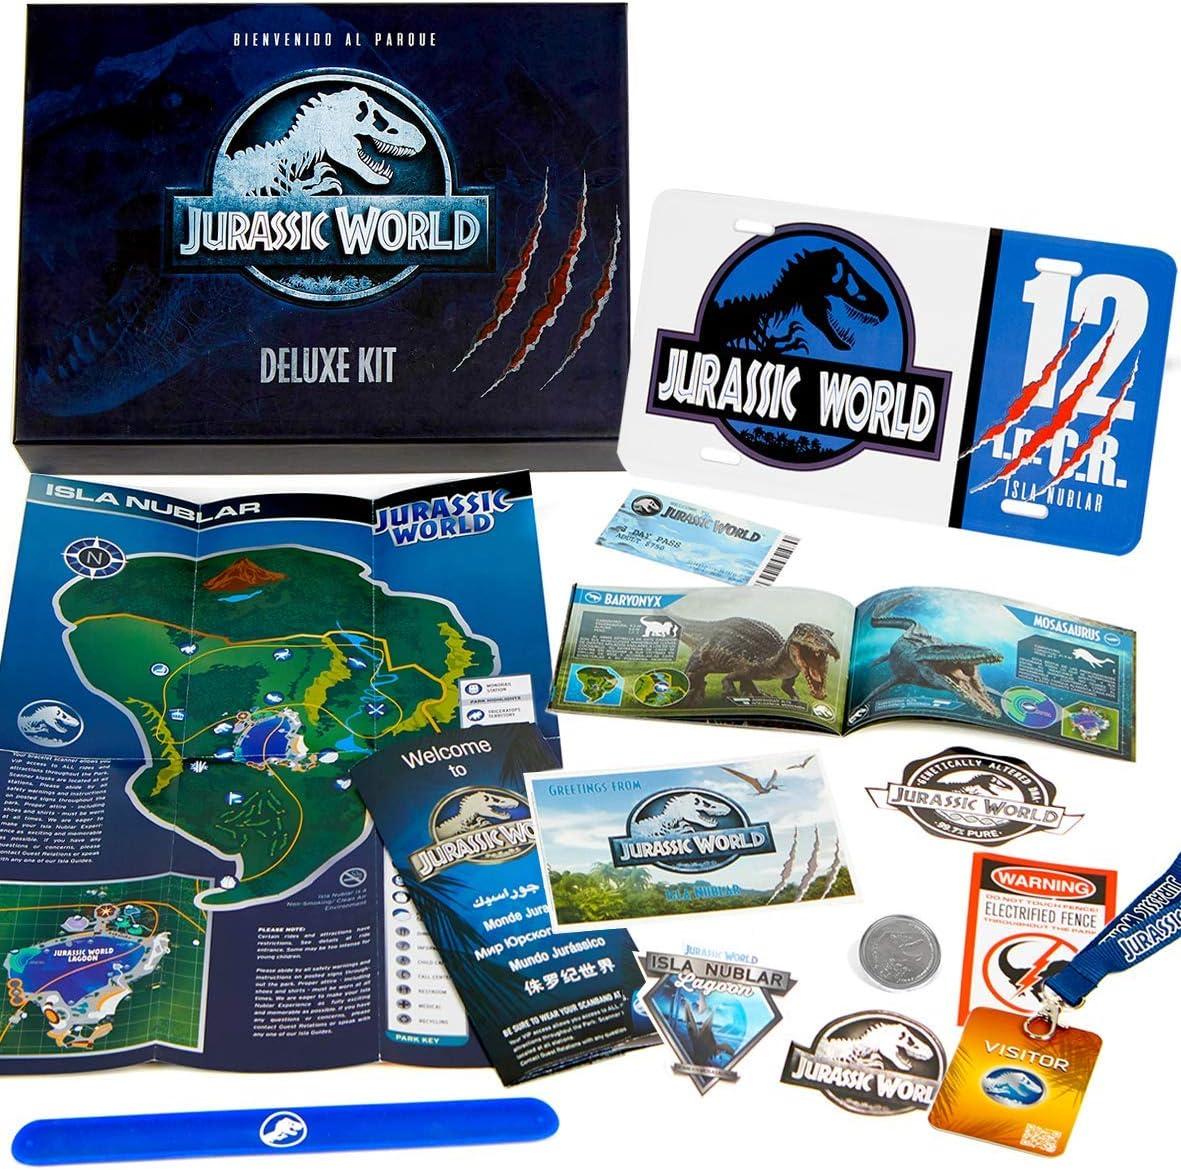 Jurassic World Deluxe Kit - Kit de Bienvenida al parque (Matricula, Entrada, Mapa, Pulsera, Guia dinosaurios, pegatinas...)